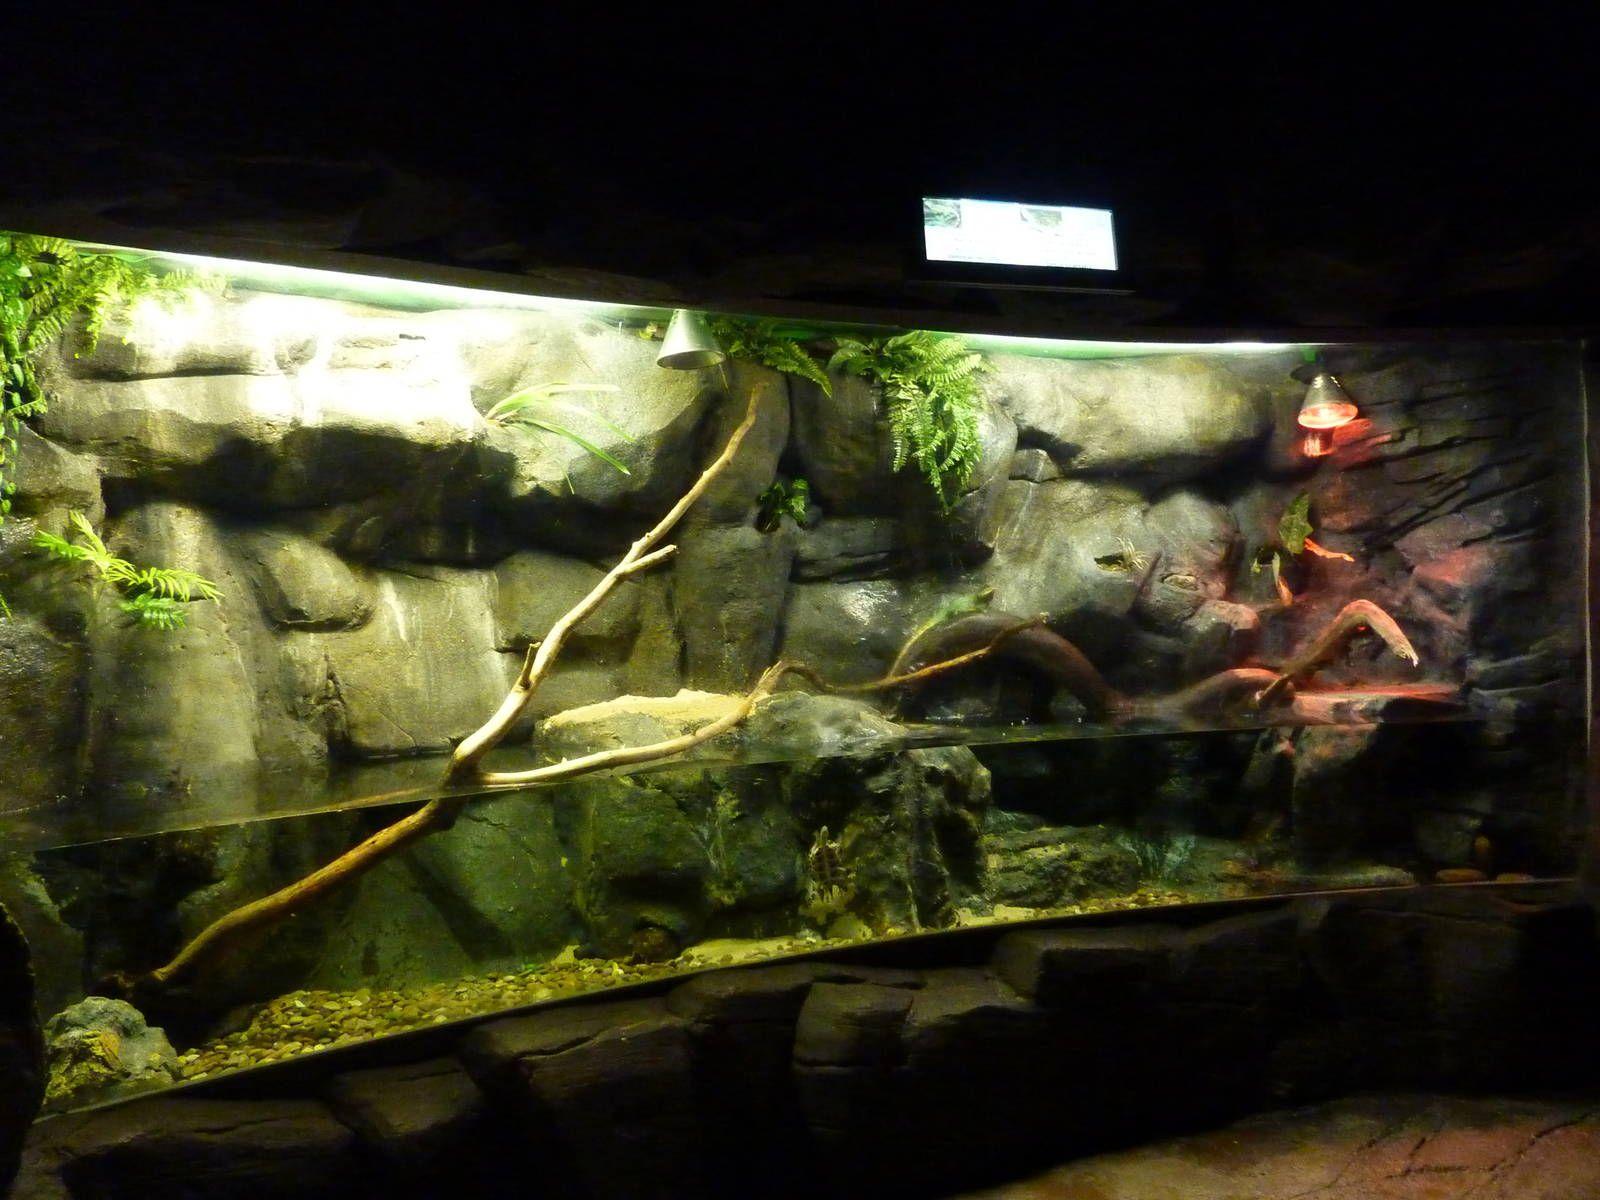 Chinese Water Dragon Enclosure